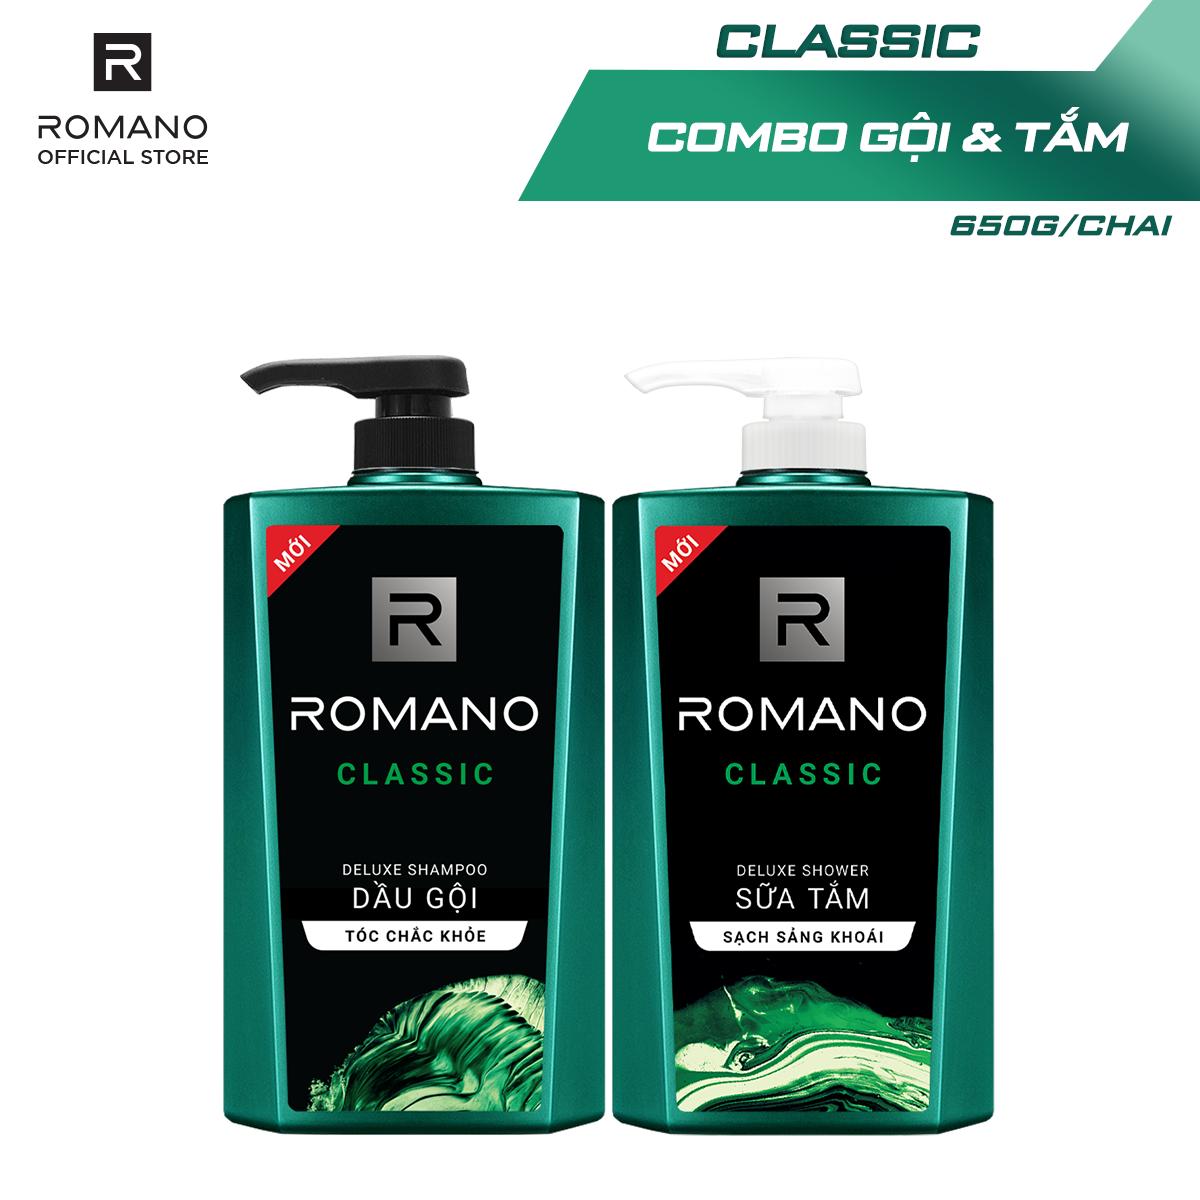 Combo Dầu gội và Sữa tắm Romano Classic 650gr/chai